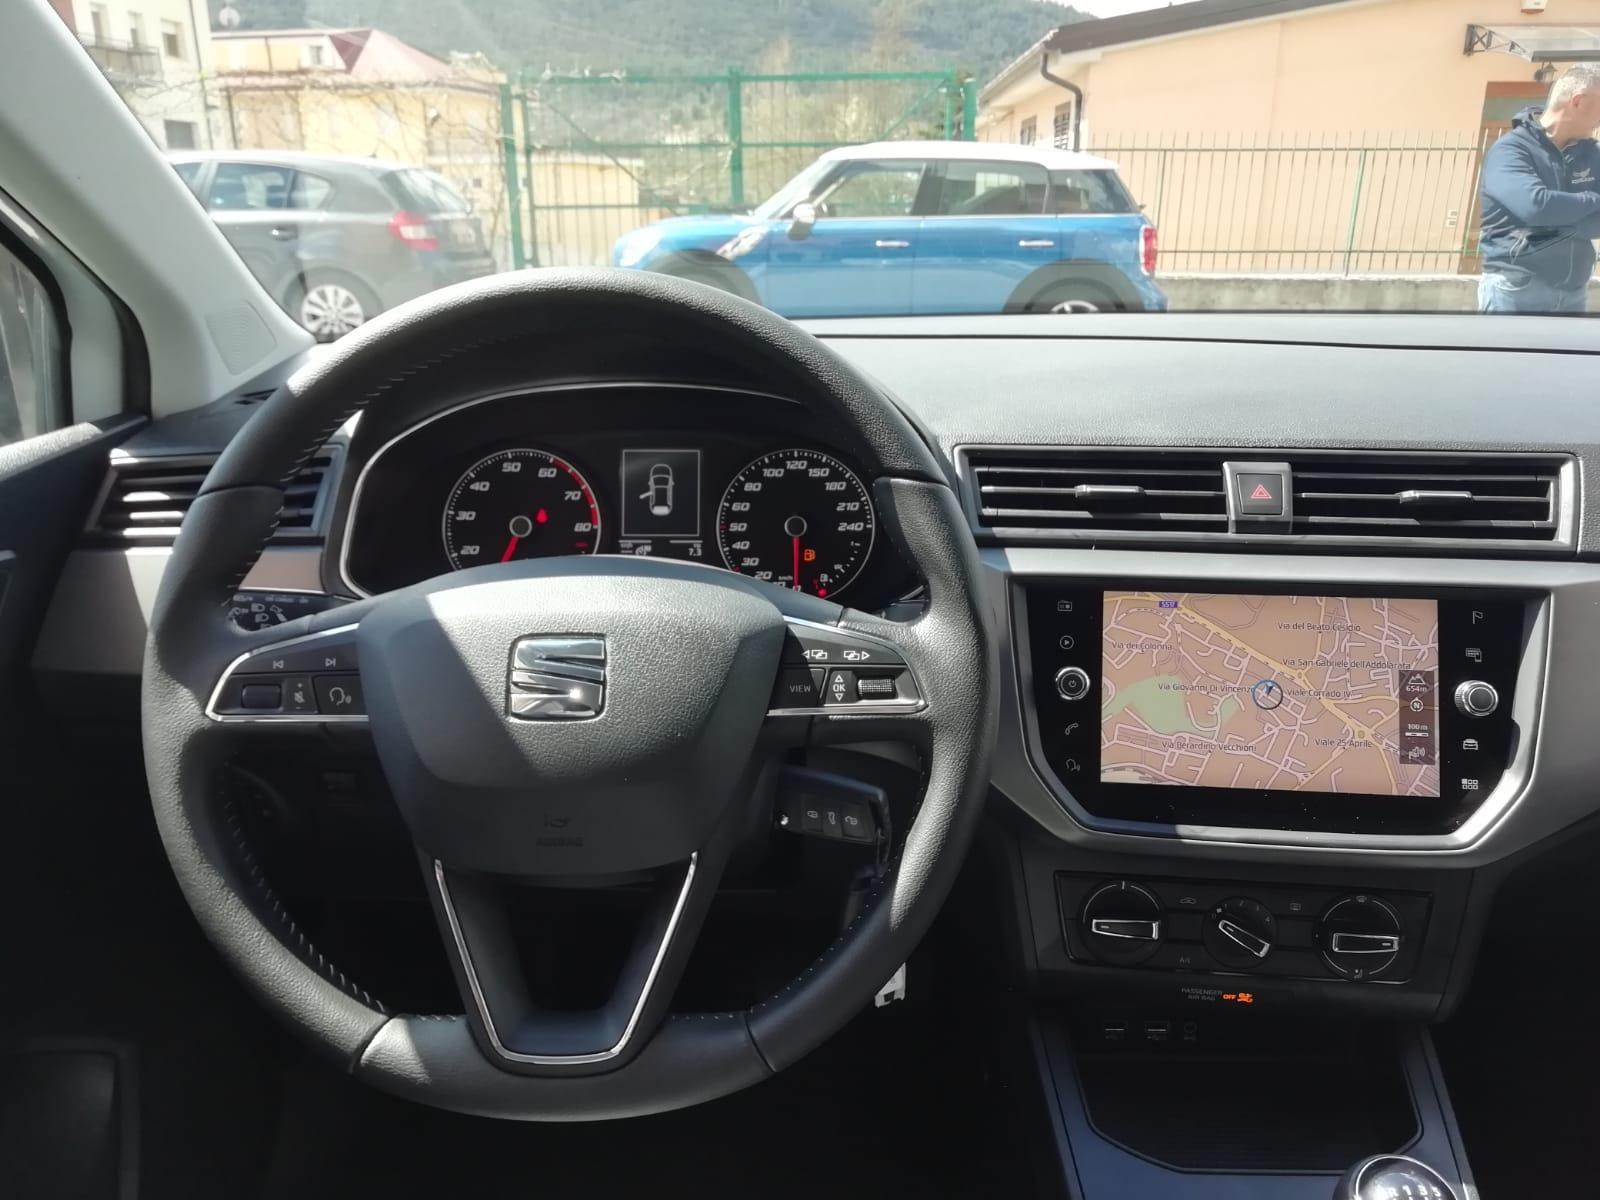 SEAT Ibiza 1.0 Business 80 cv